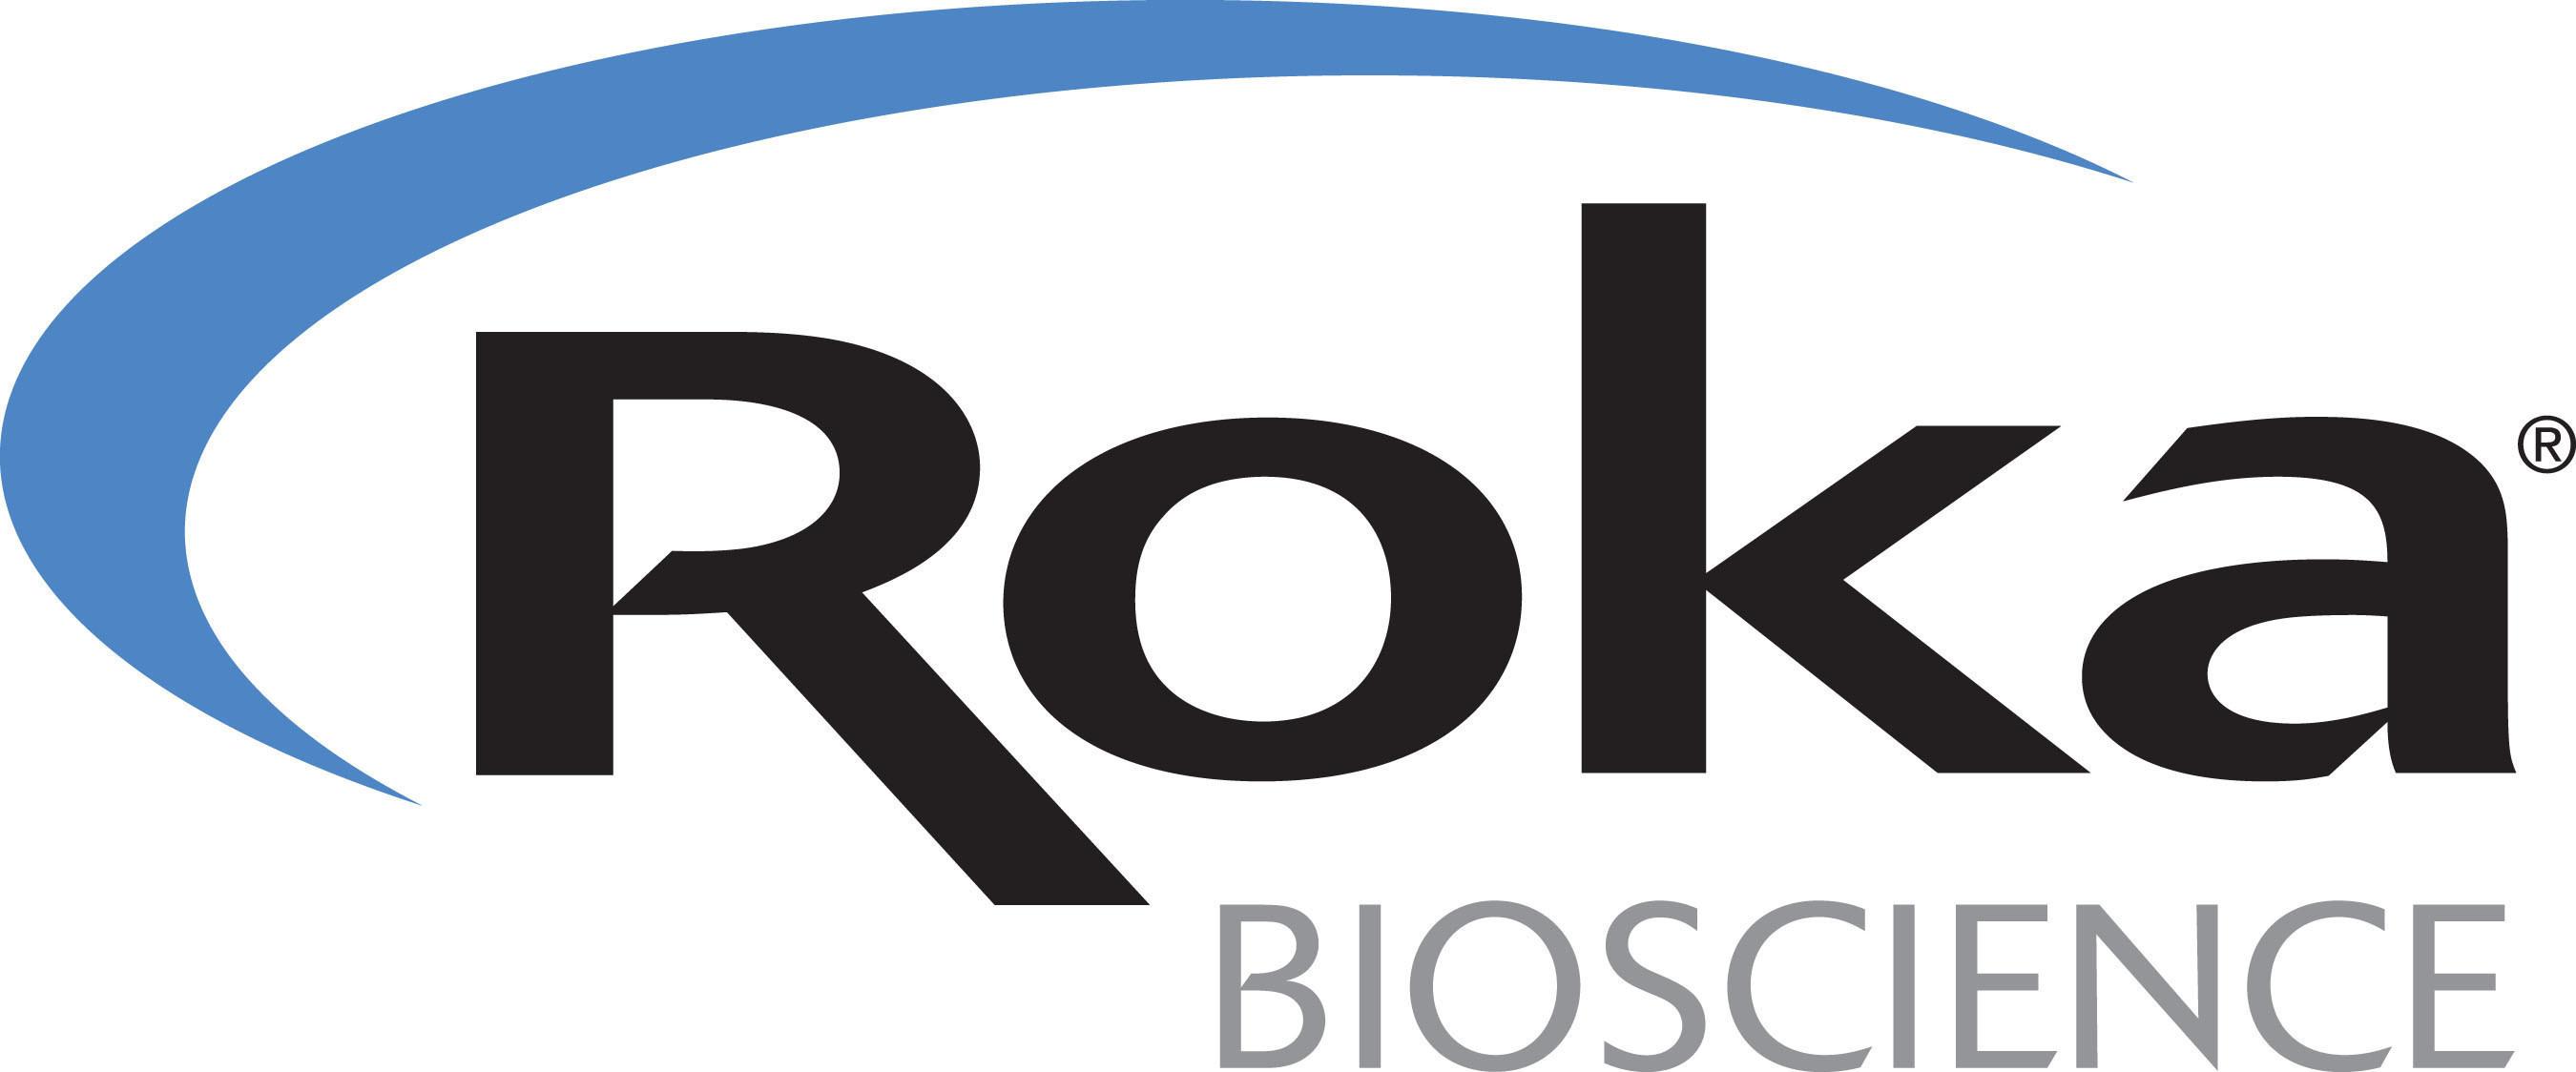 Roka Bioscience Demonstrates Utility of Limits-Based